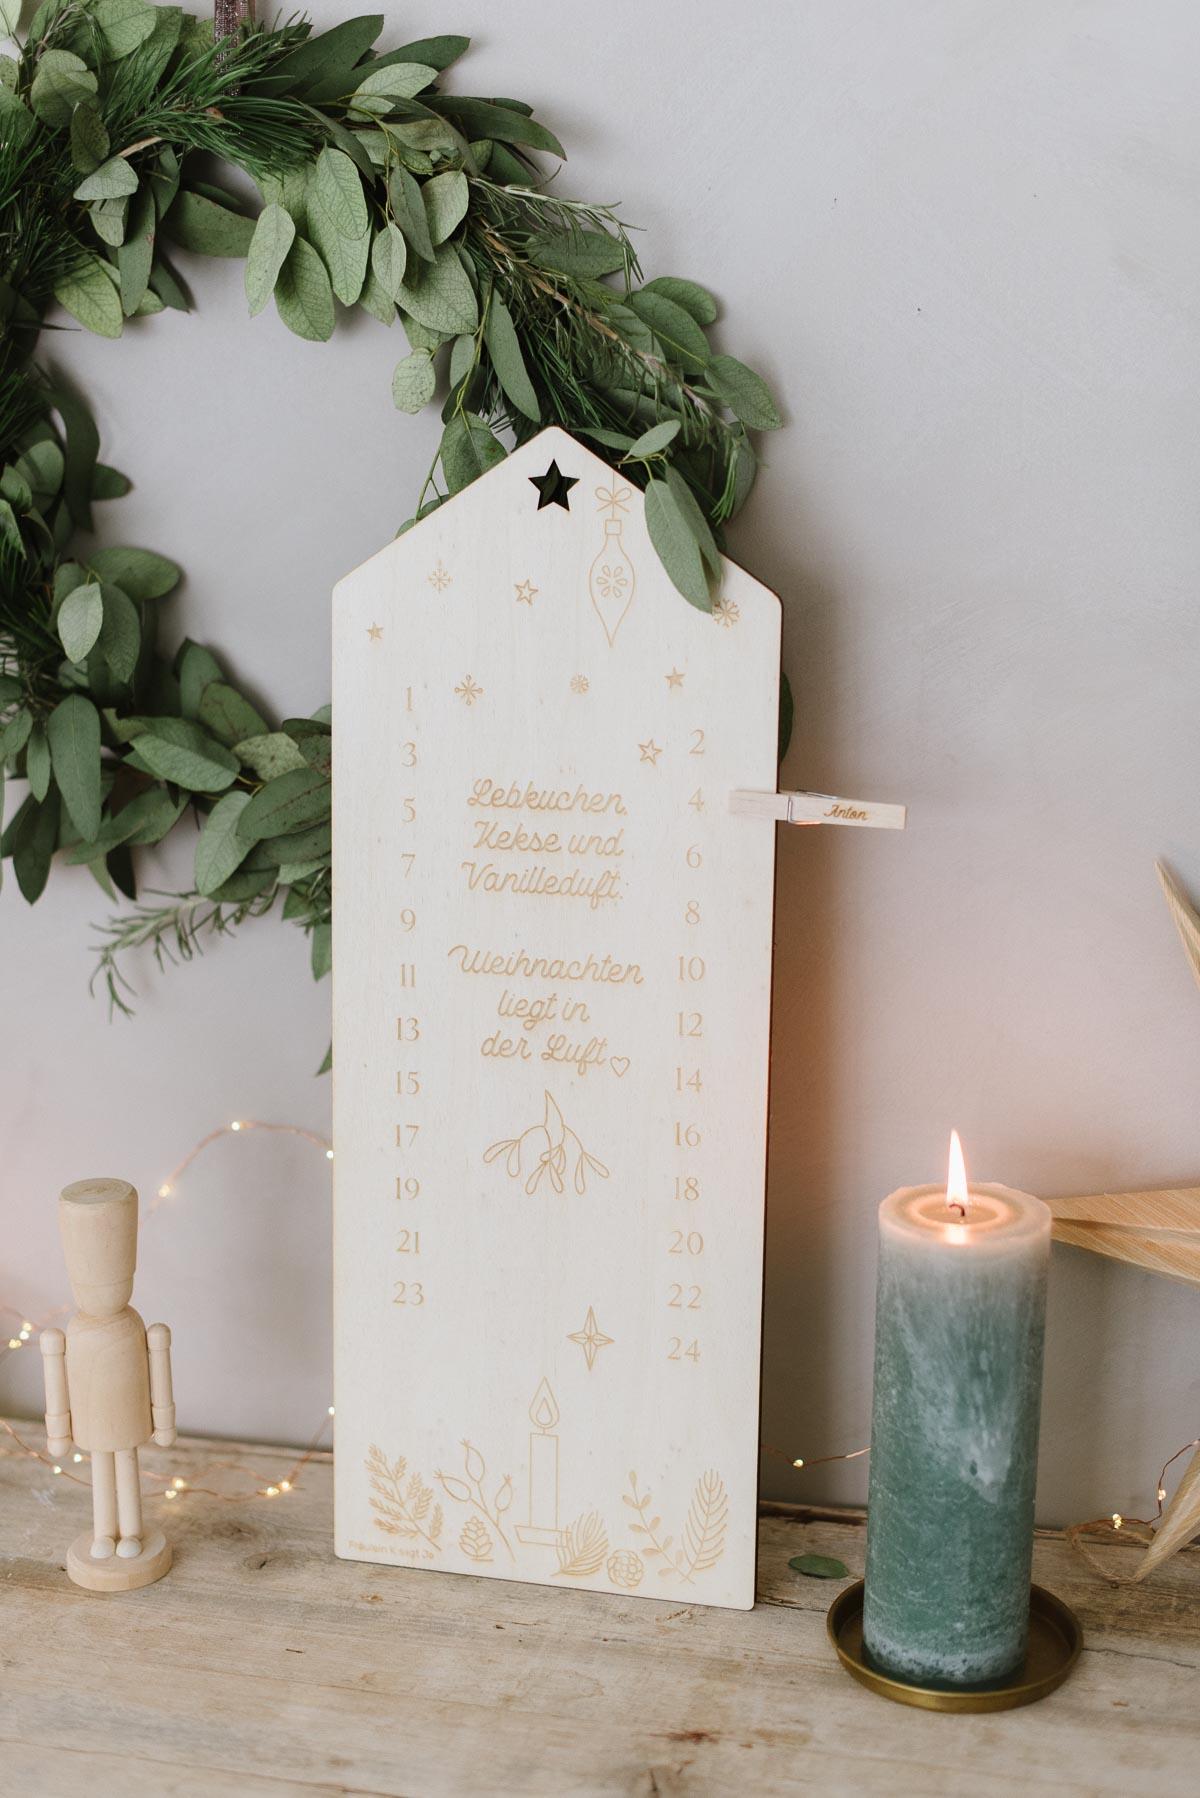 Countdown Adventskalender aus Holz